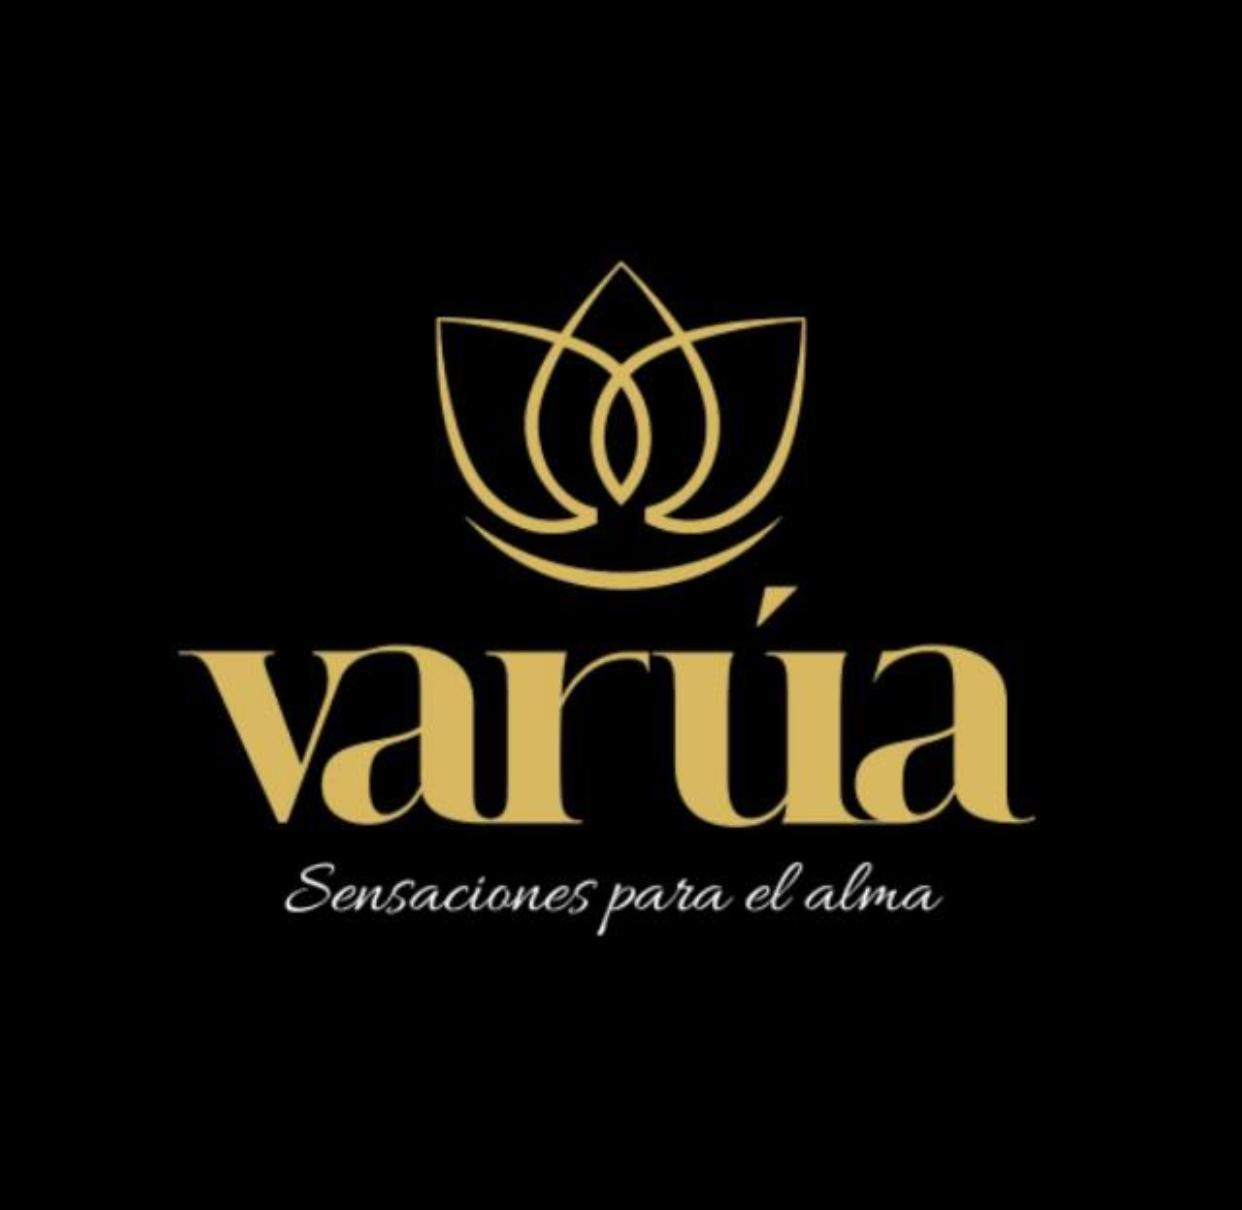 Varúa